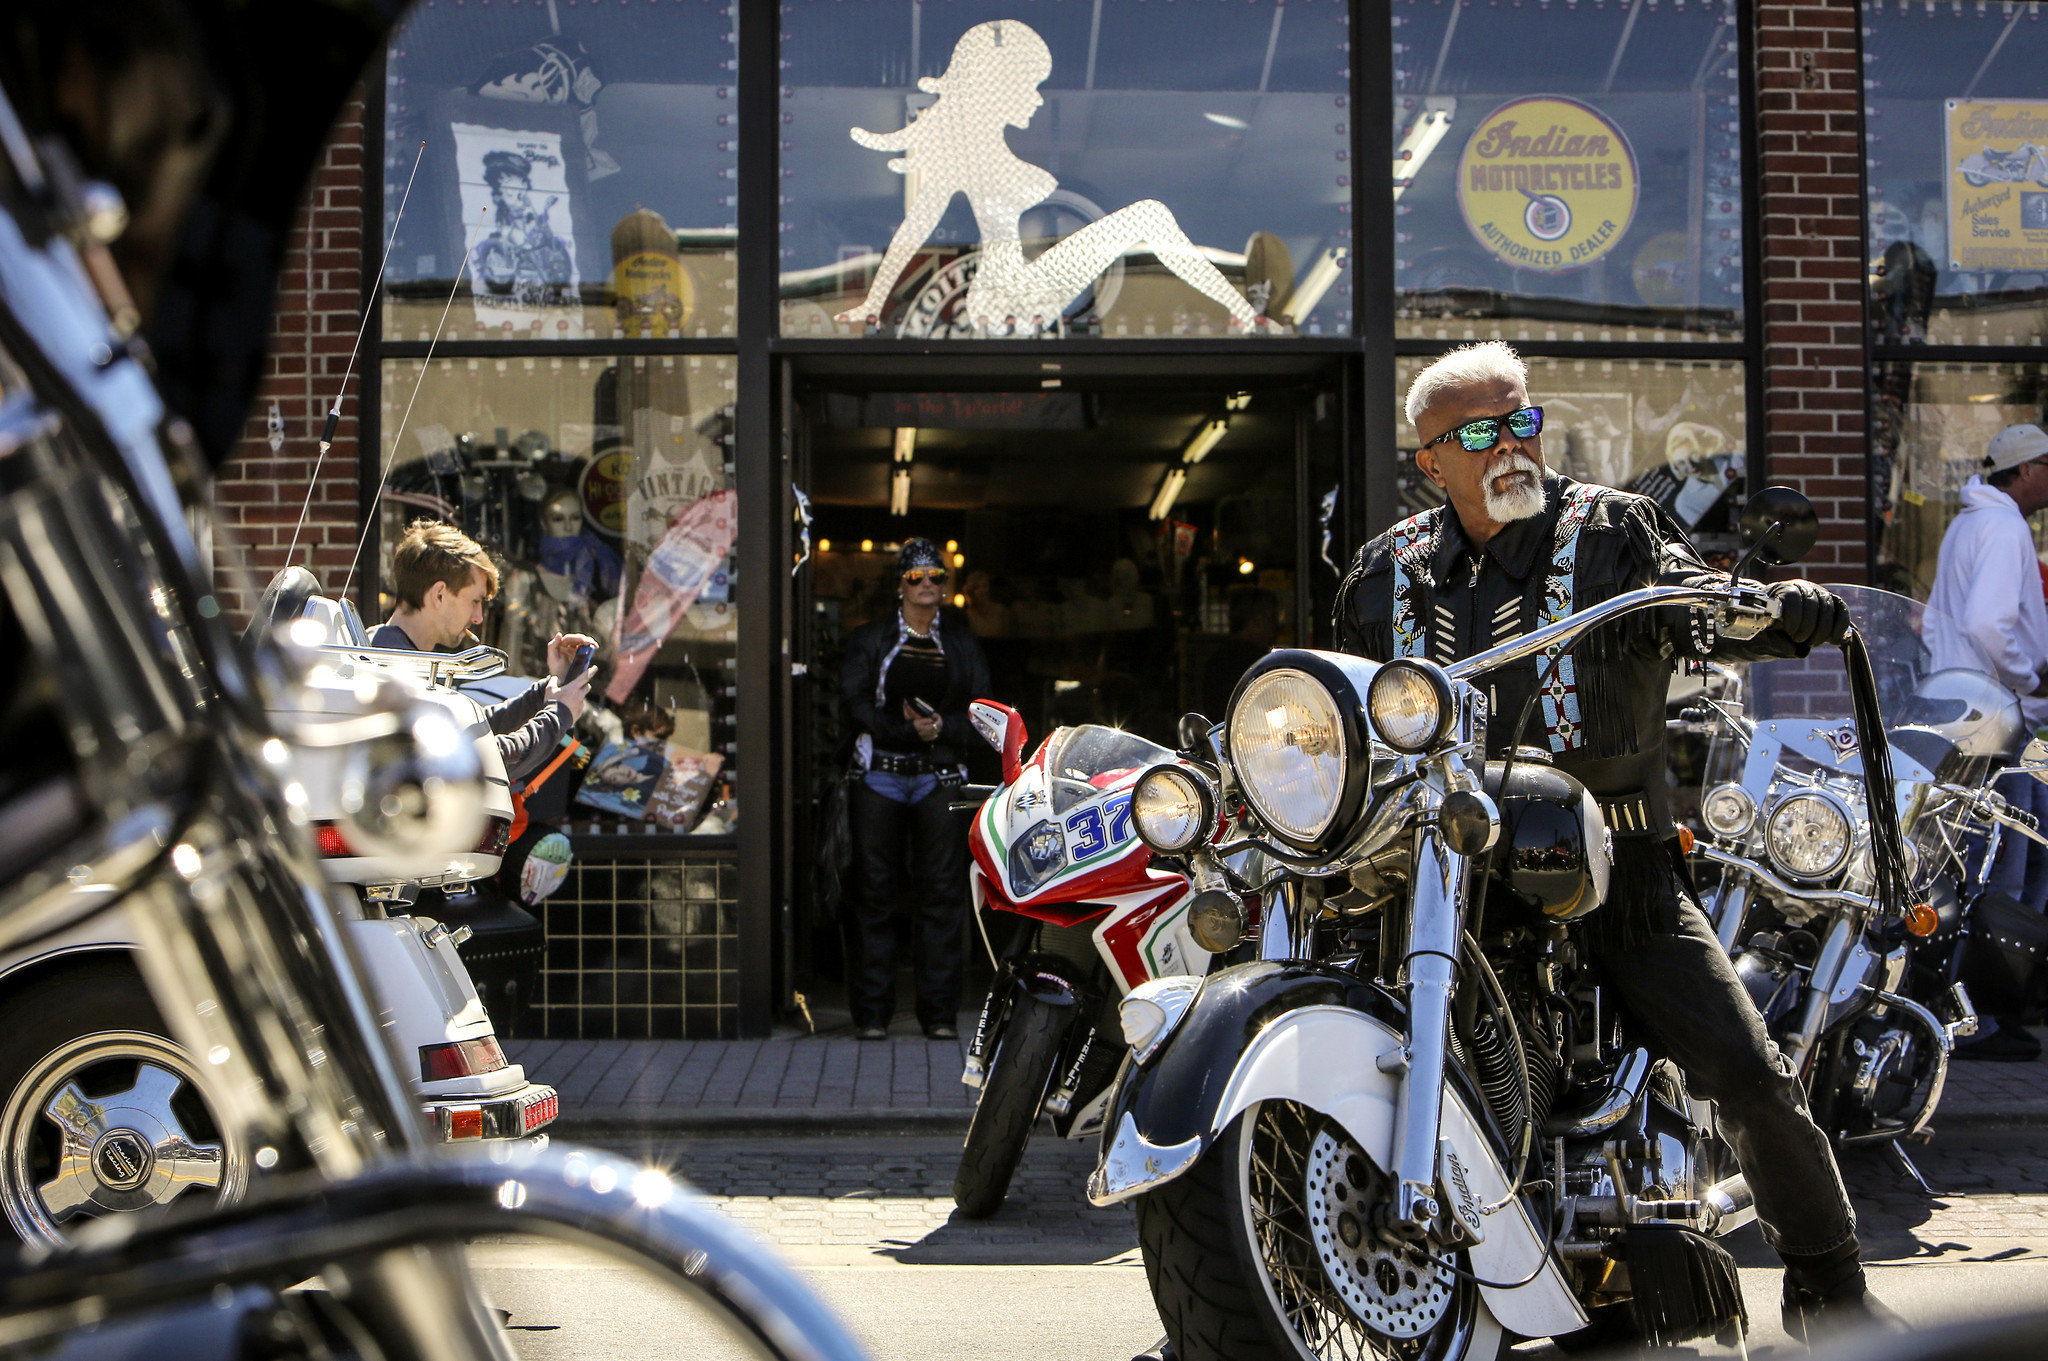 Daytona Bike Week Pictures Through The Years